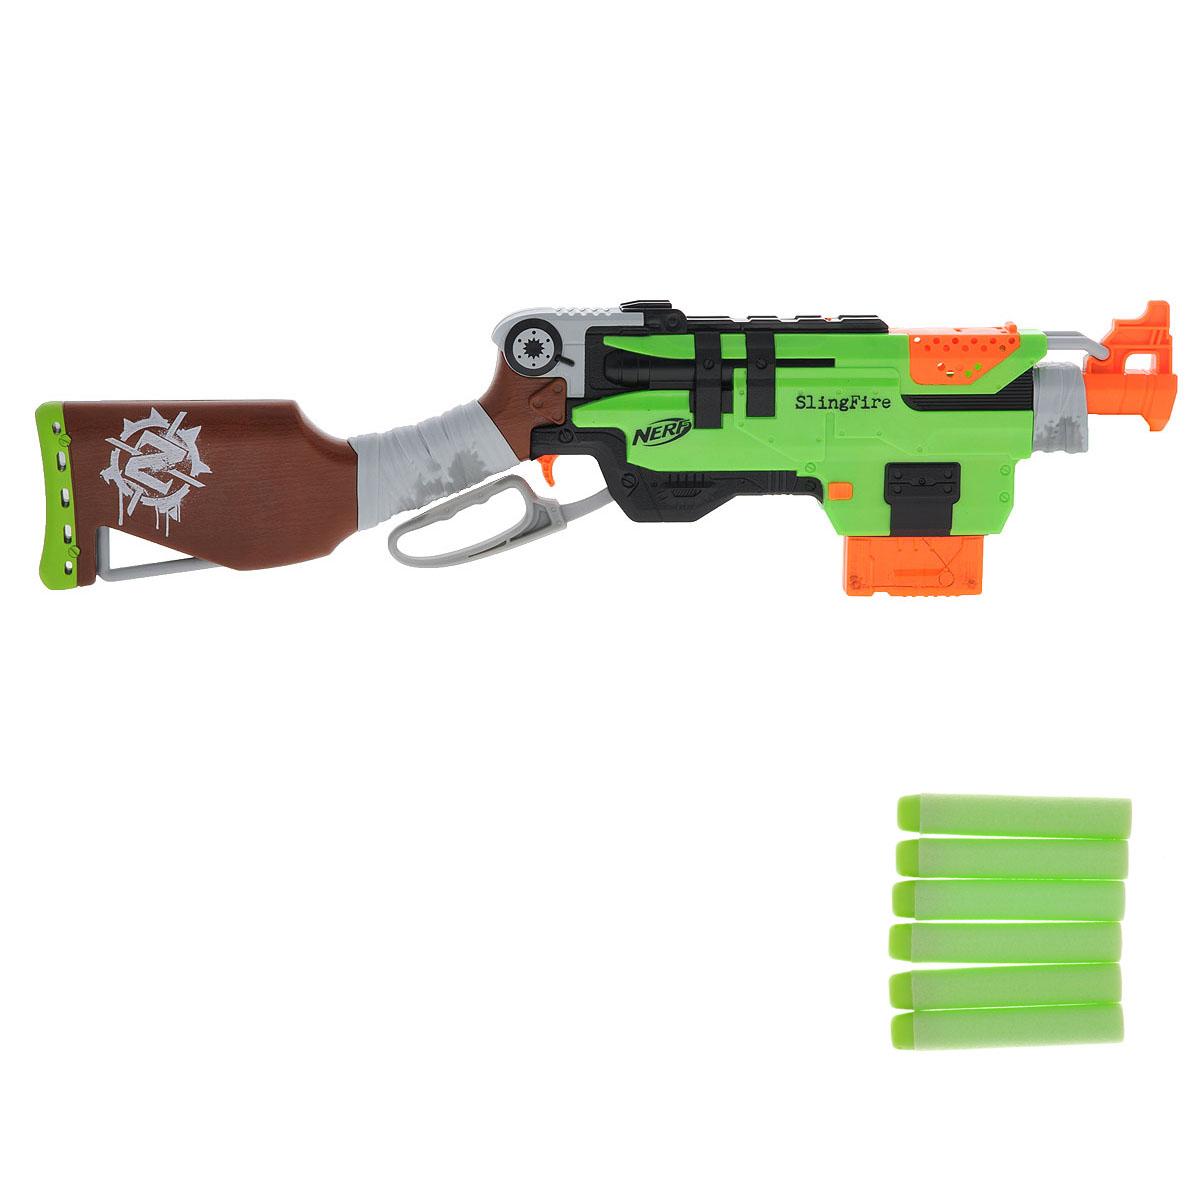 Nerf Бластер Zombie Strike: Slingfire с патронами цвет салатовый коричневый оранжевый